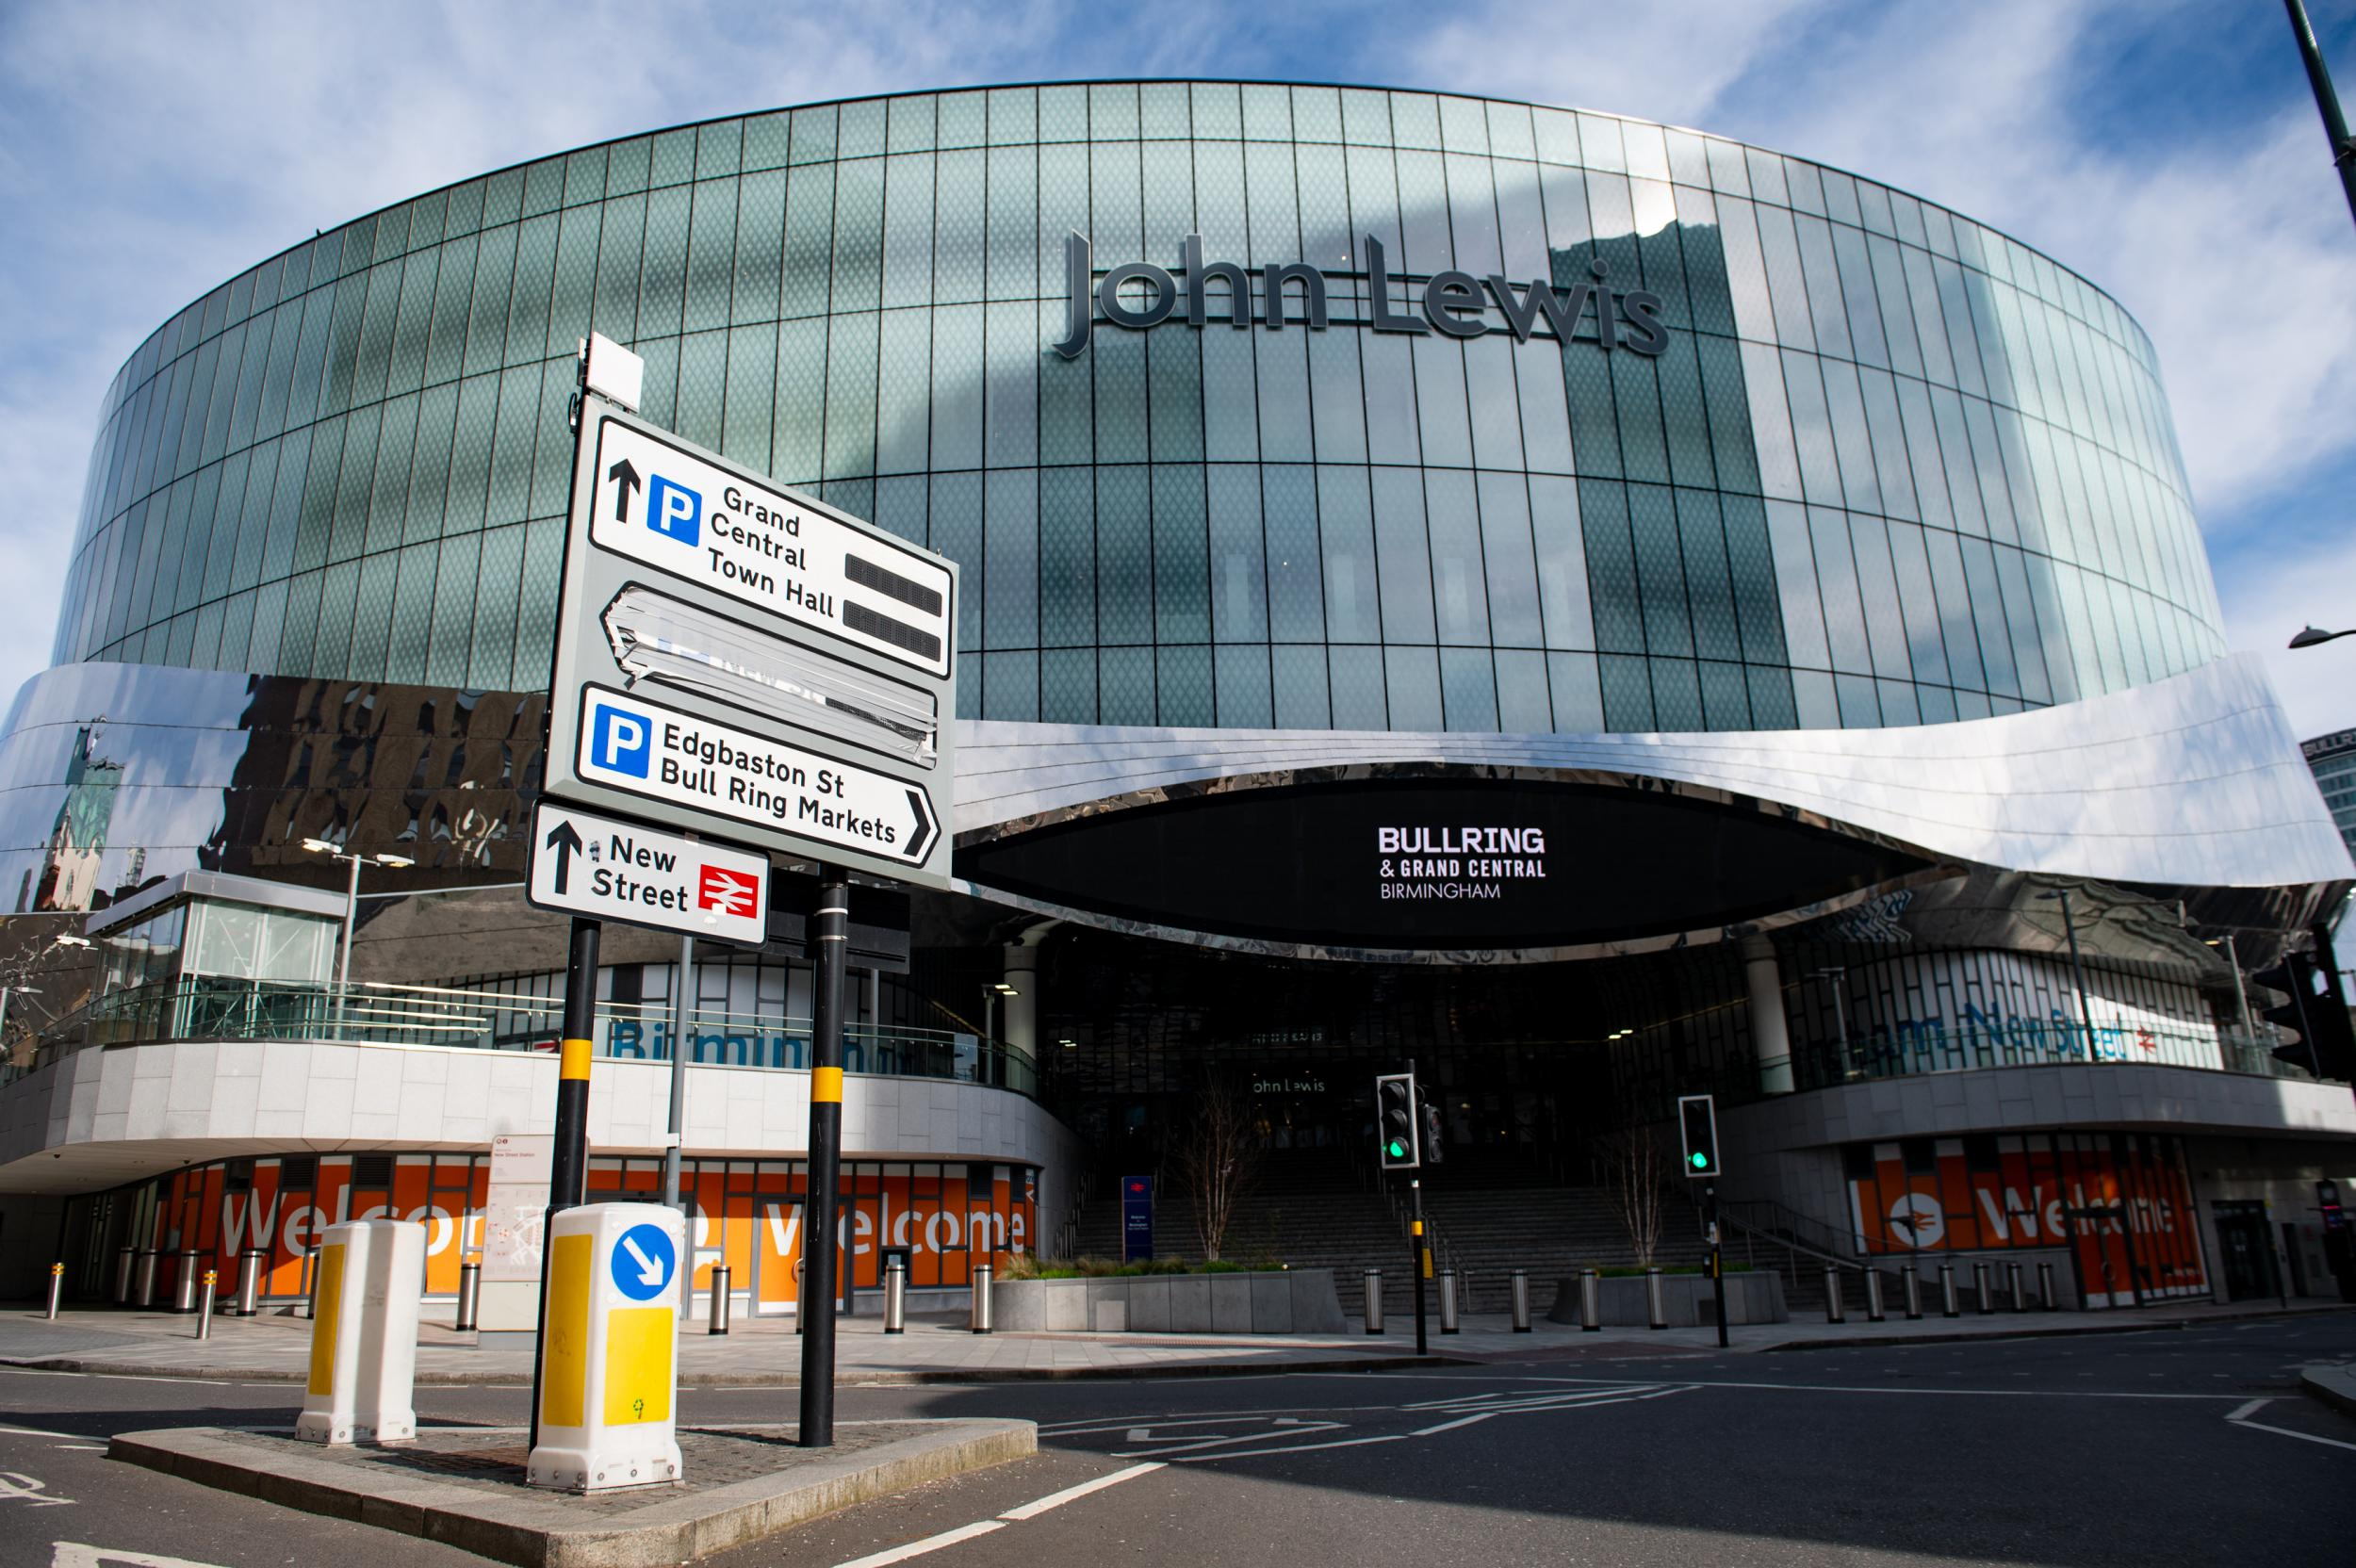 John Lewis confirms 8 retailer closures including Birmingham flagship